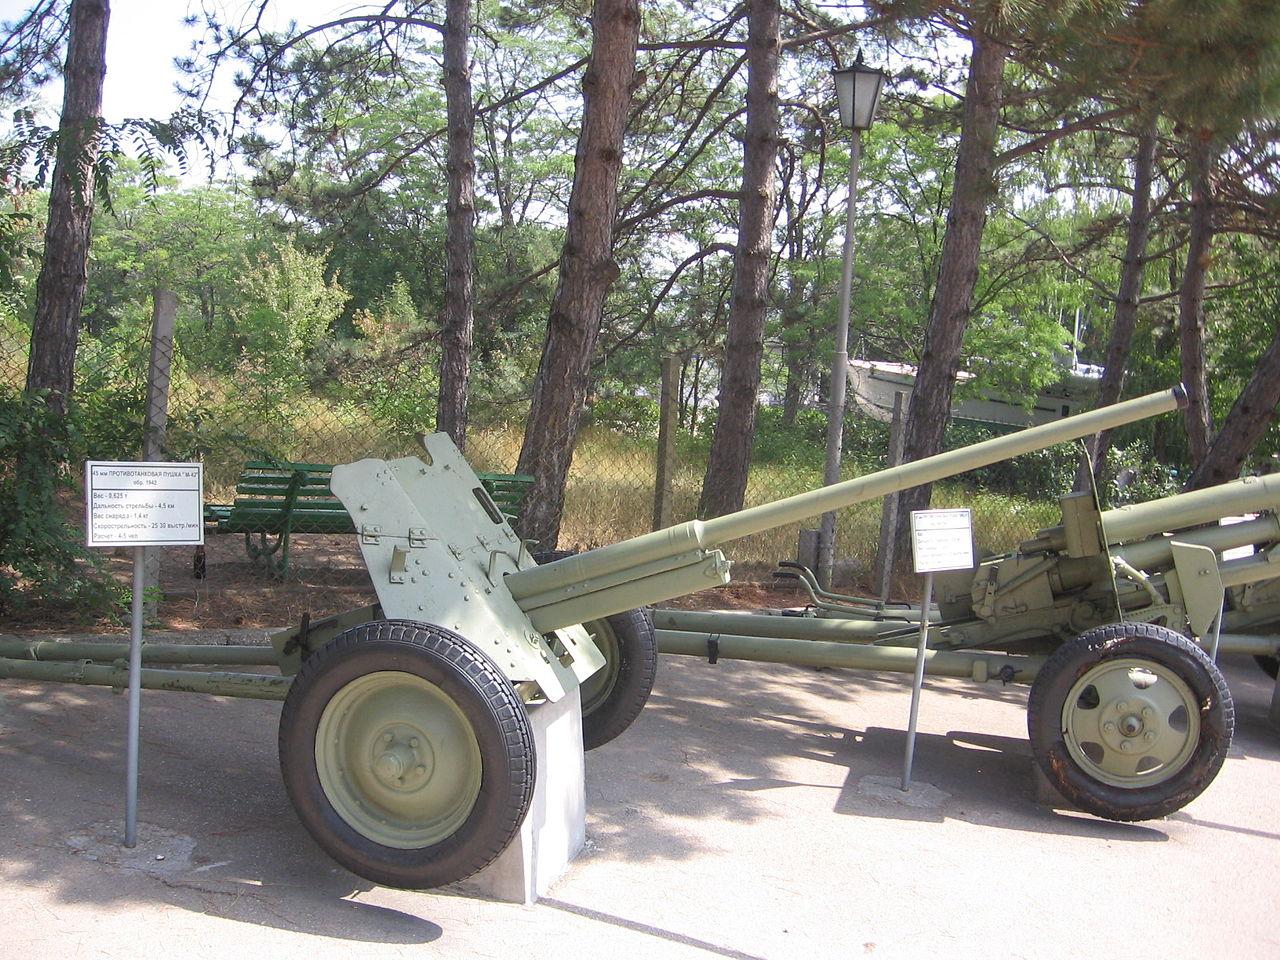 1280px-45_mm_anti-tank_gun_M1942_(M-42)_Museum_on_Sapun_Mountain_Sevastopol_1